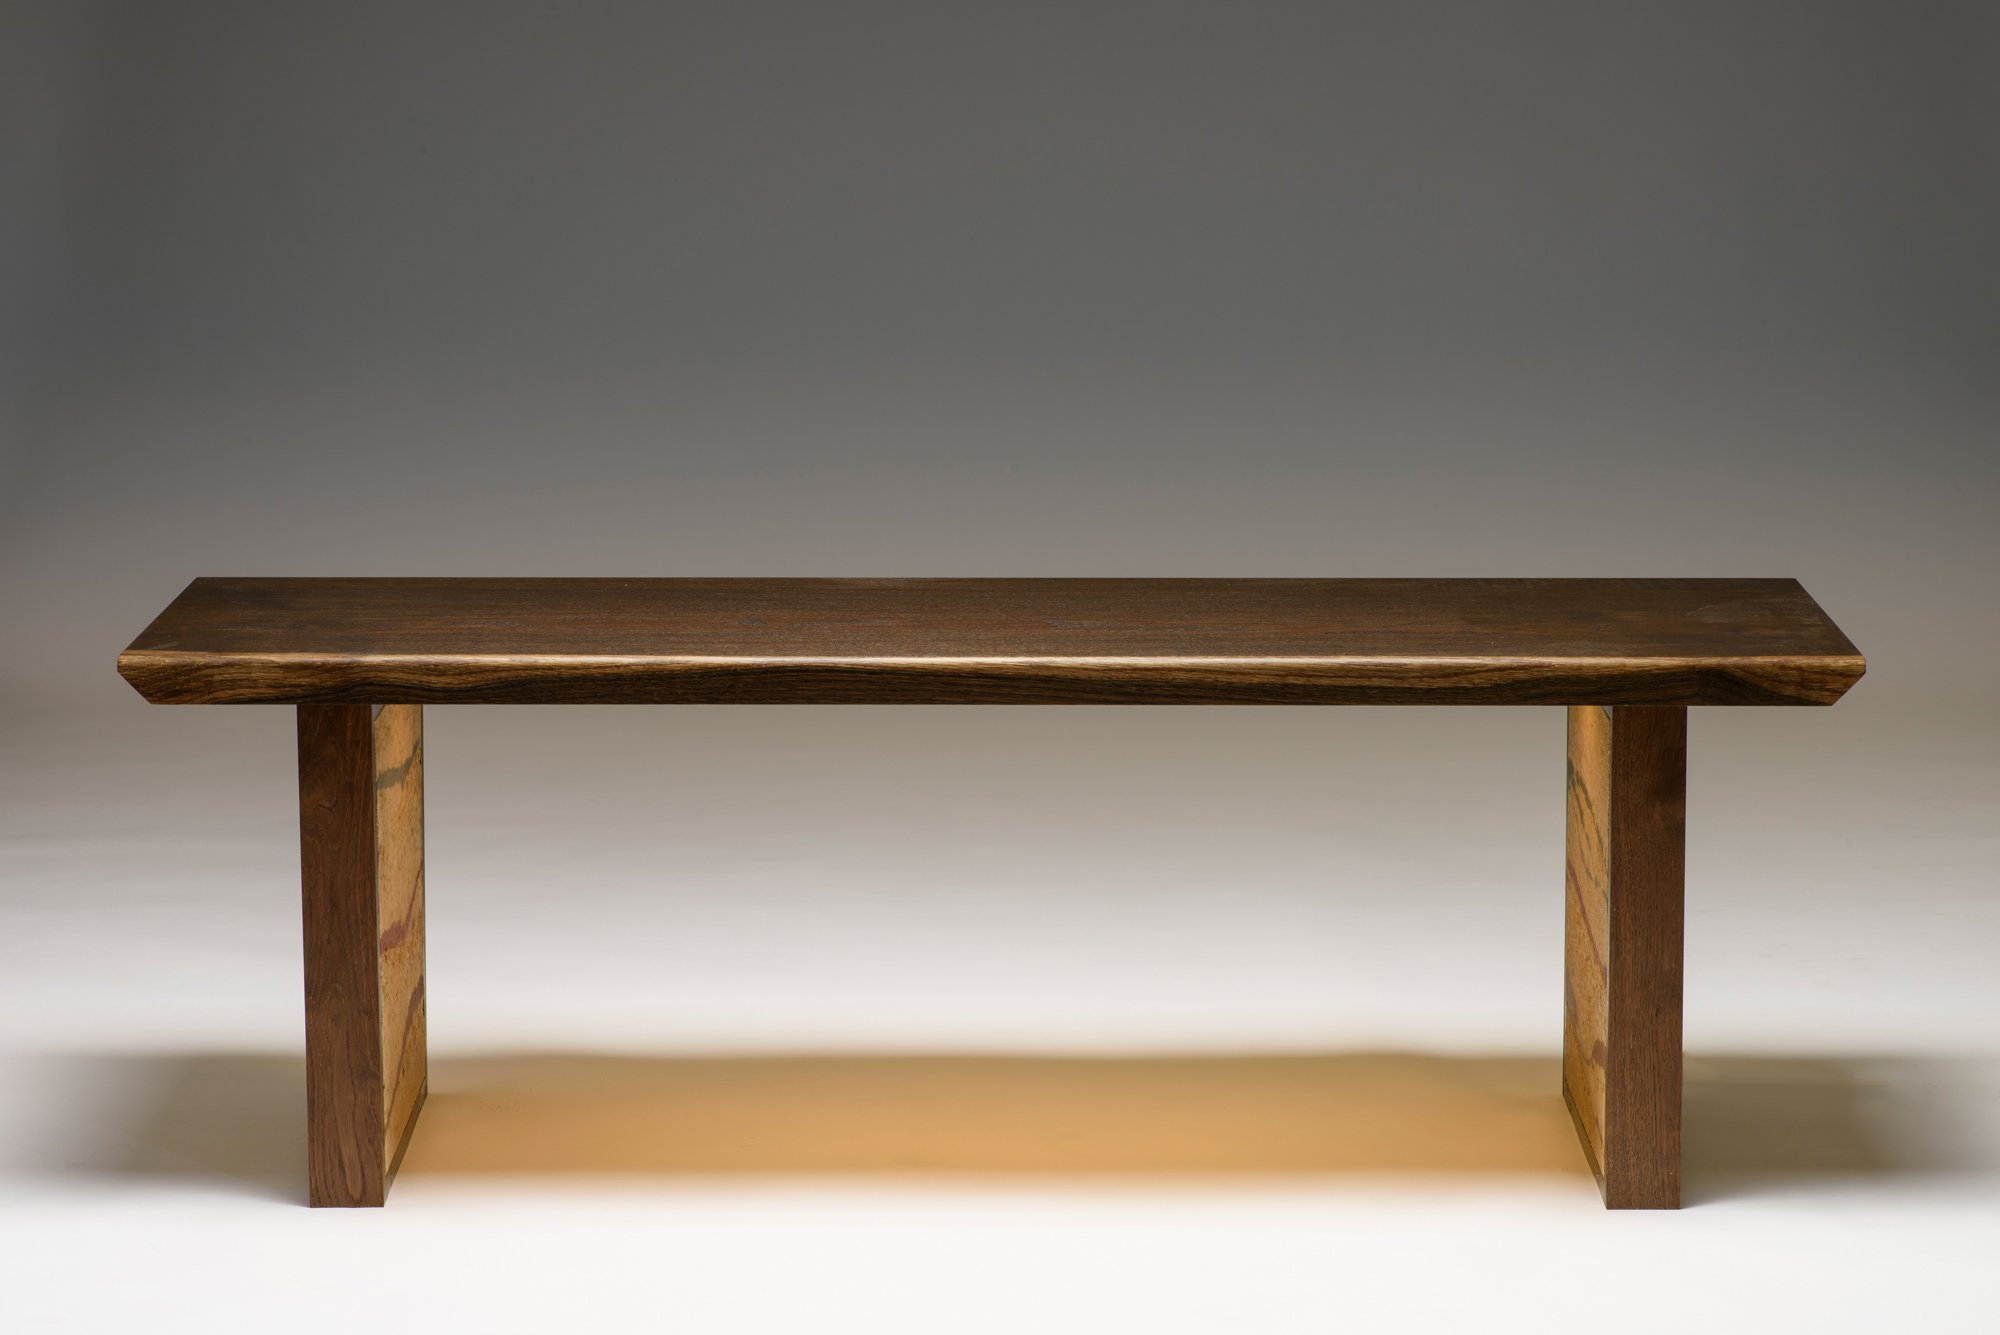 Massivholzsitzbank mit intigrierter LED-Beleuchtung. Wangen aus Lehm.